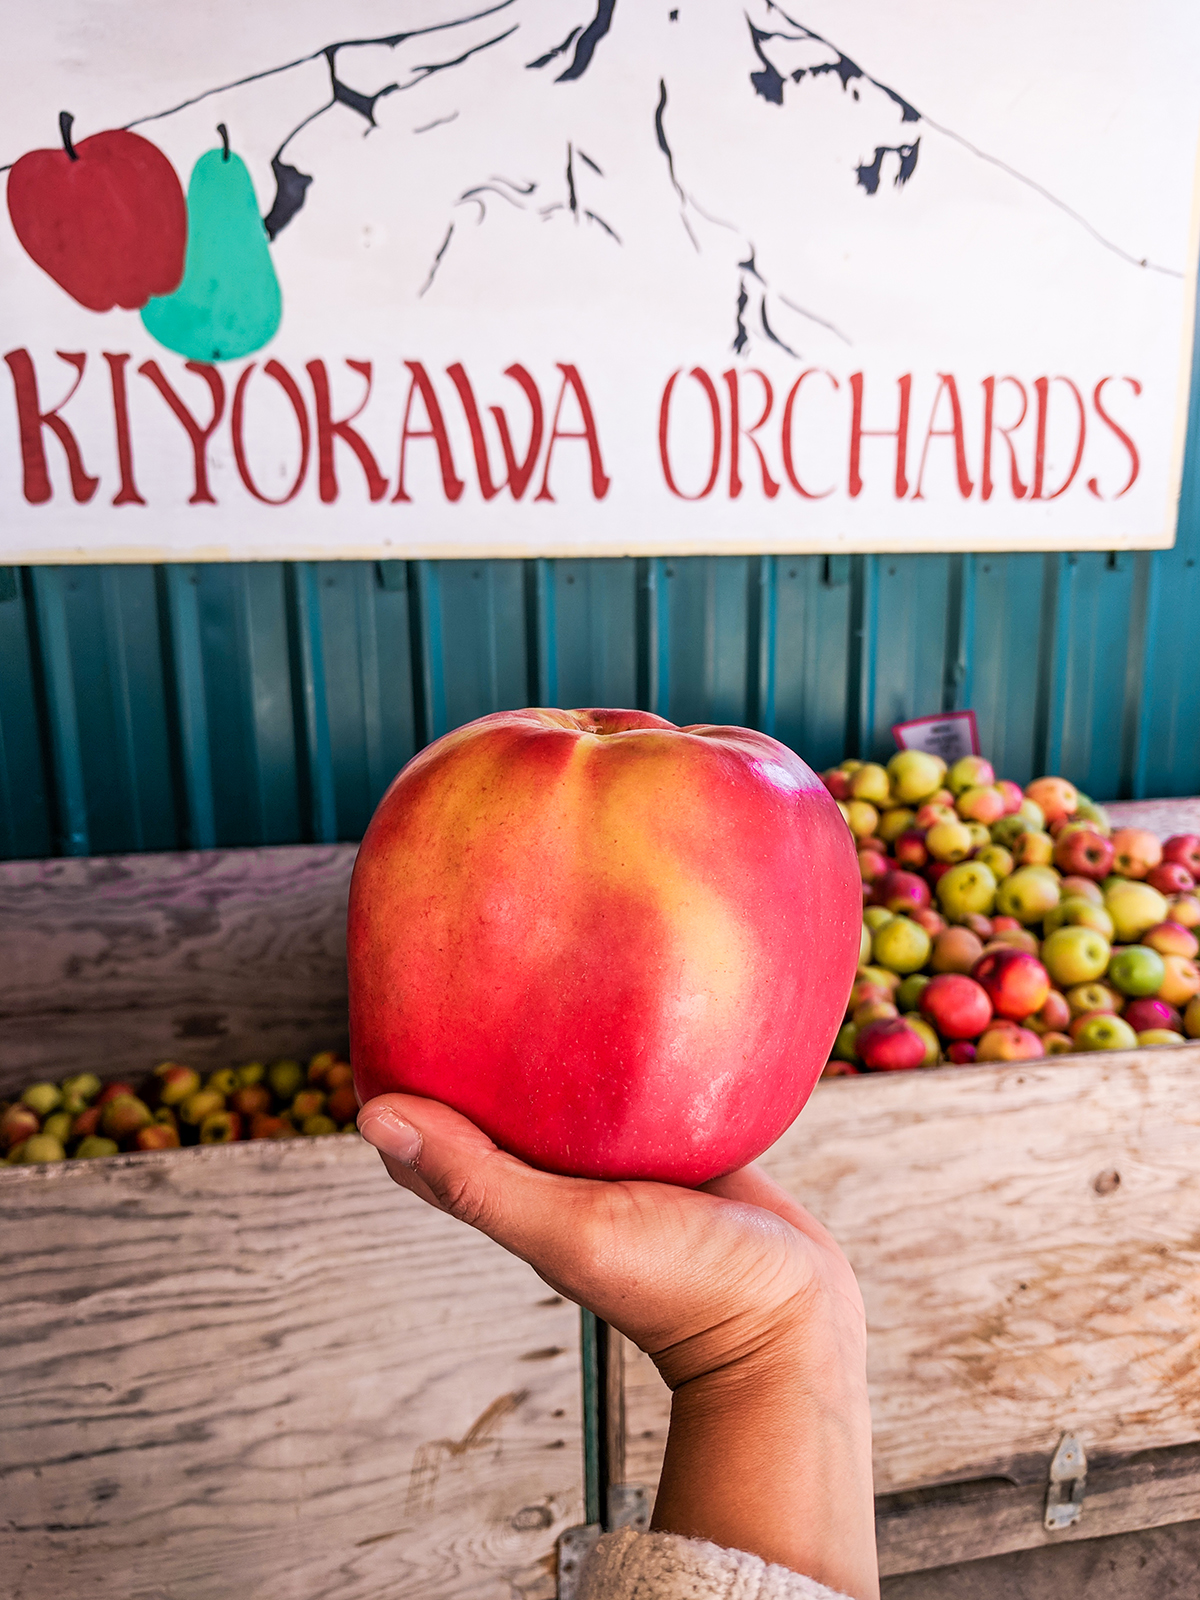 Fruit-loop-apple-Kiyokawa.jpg